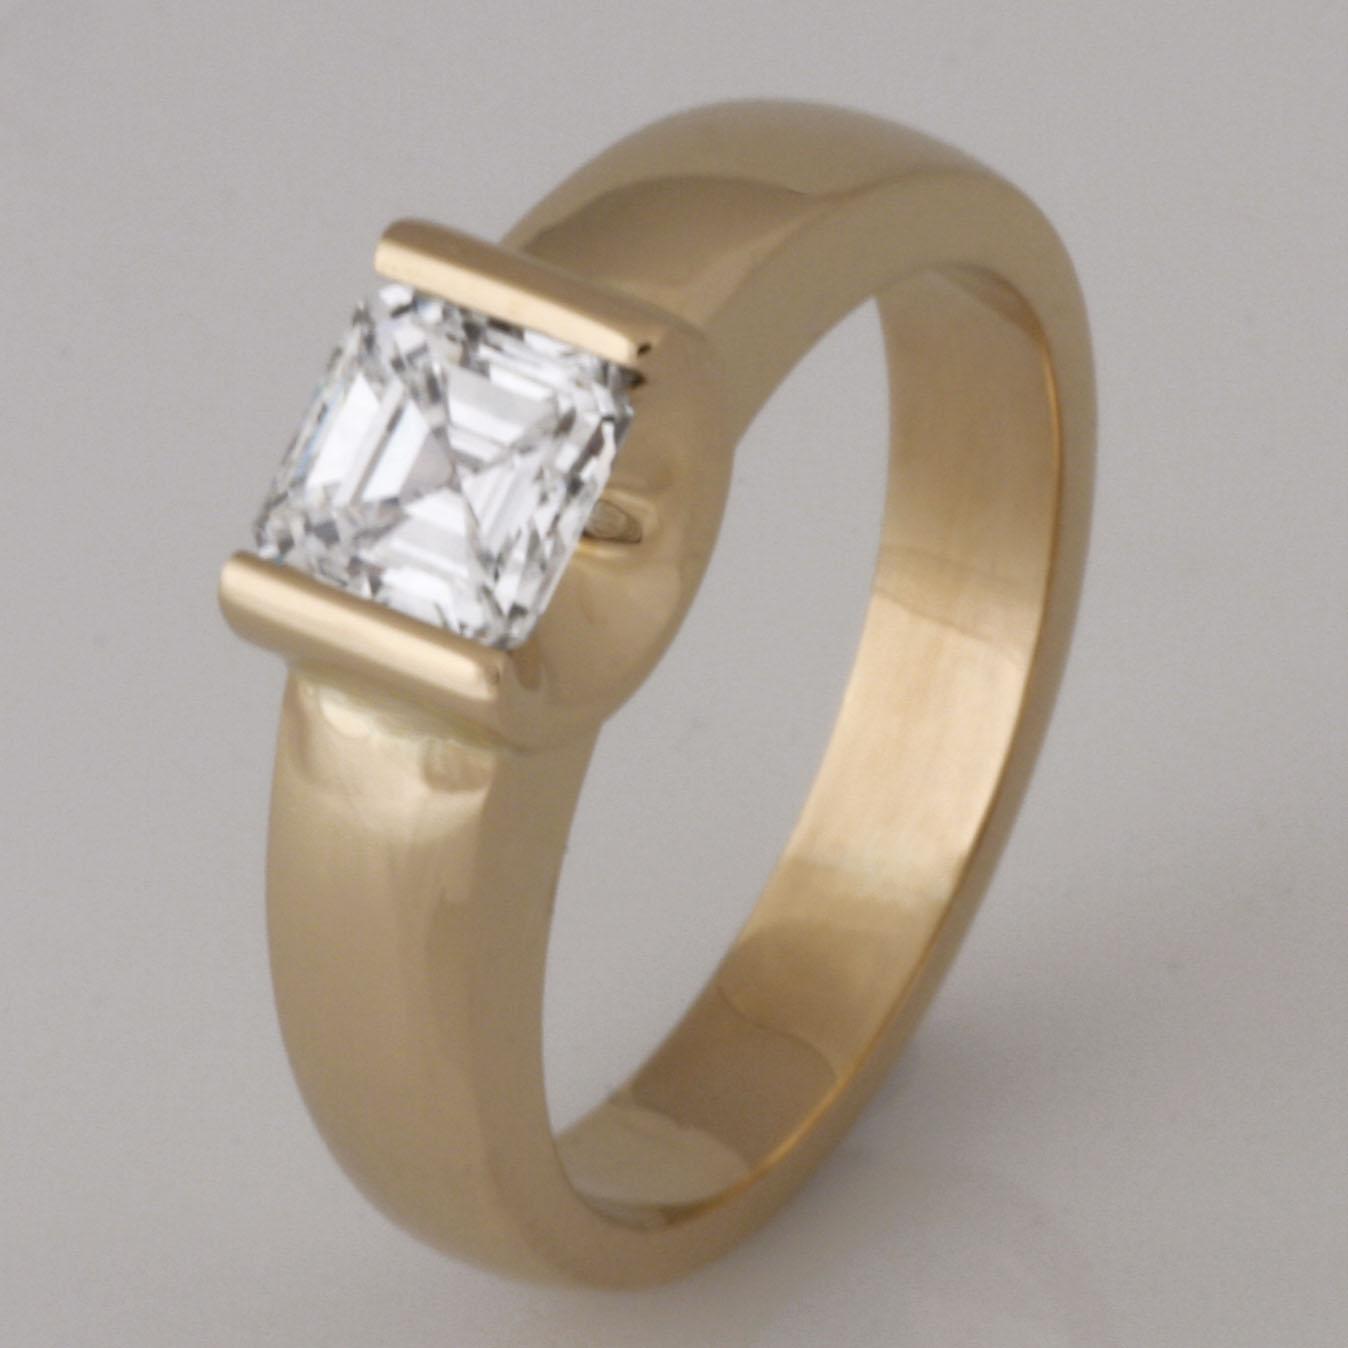 Handmade 18ct yellow gold ladies square emerald cut diamond engagement ring